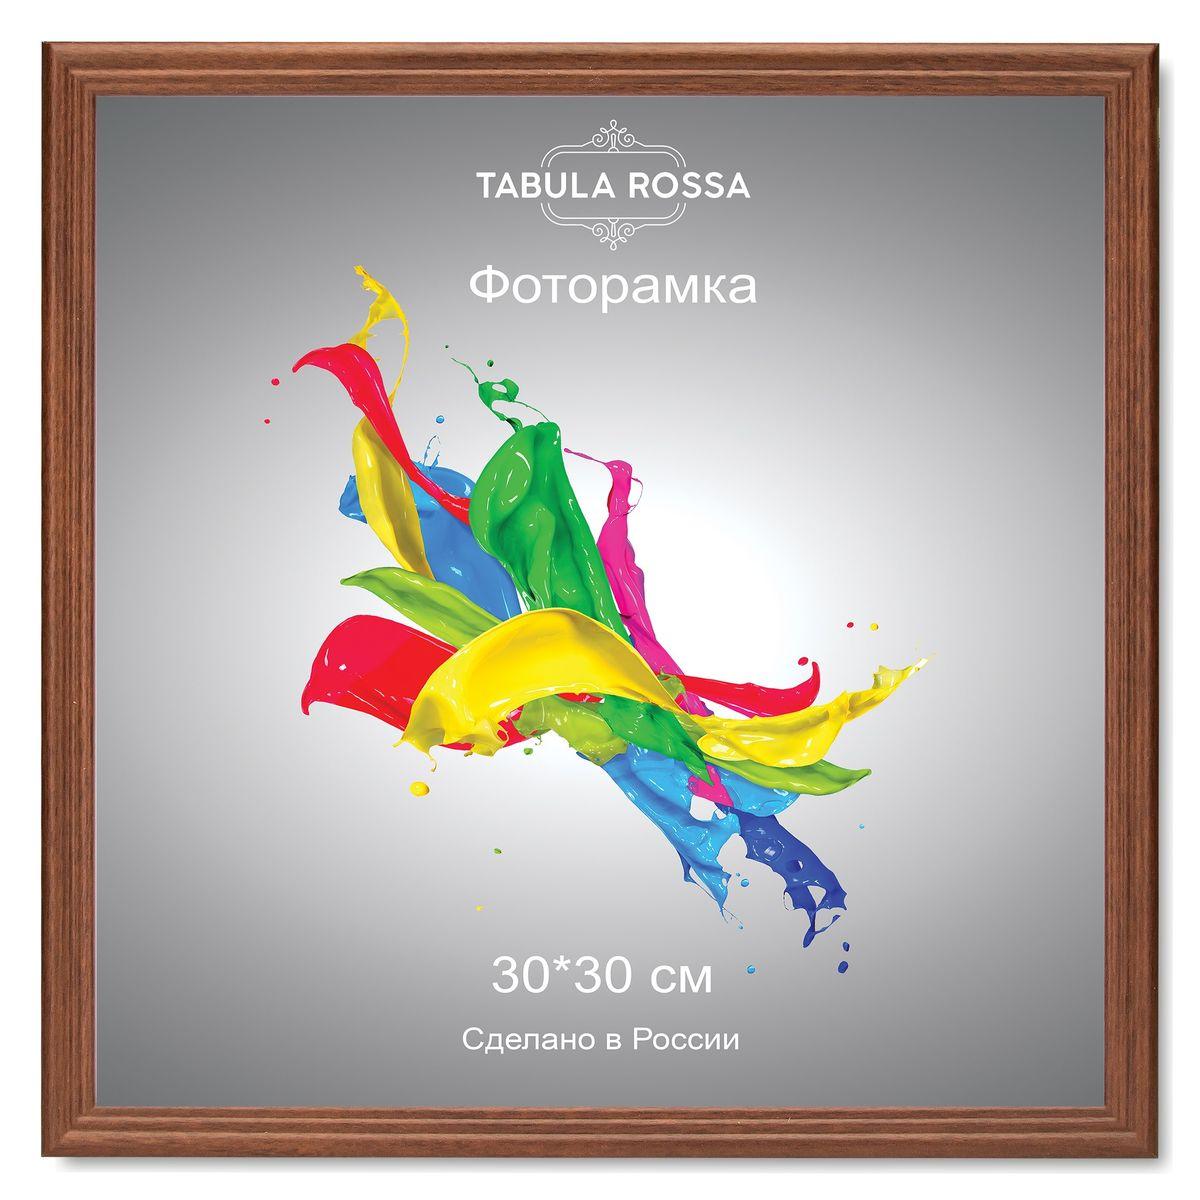 Фоторамка Tabula Rossa, цвет: орех, 30 х 30 см. ТР 5141 фоторамки tabula rossa фоторамка 13х18 455